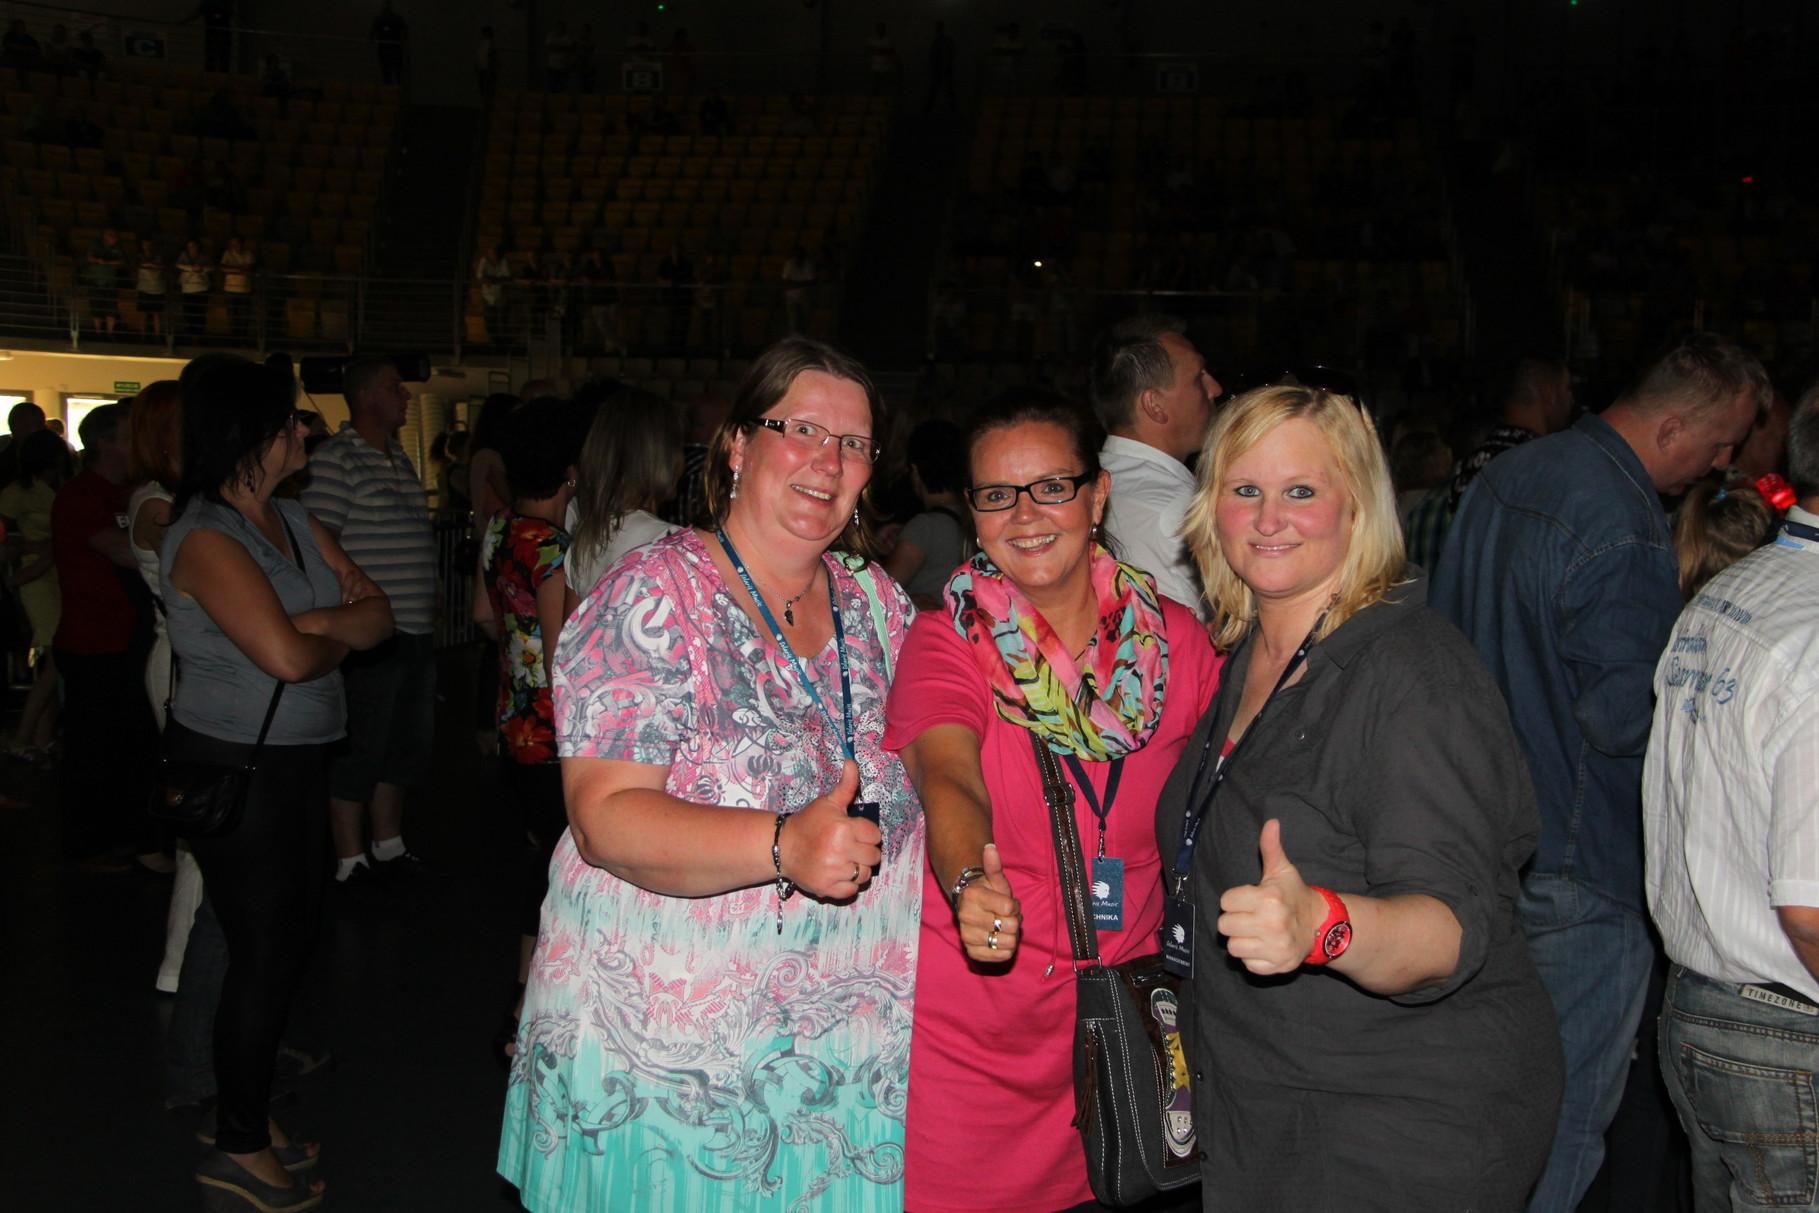 Kati, Astrid, Yvette